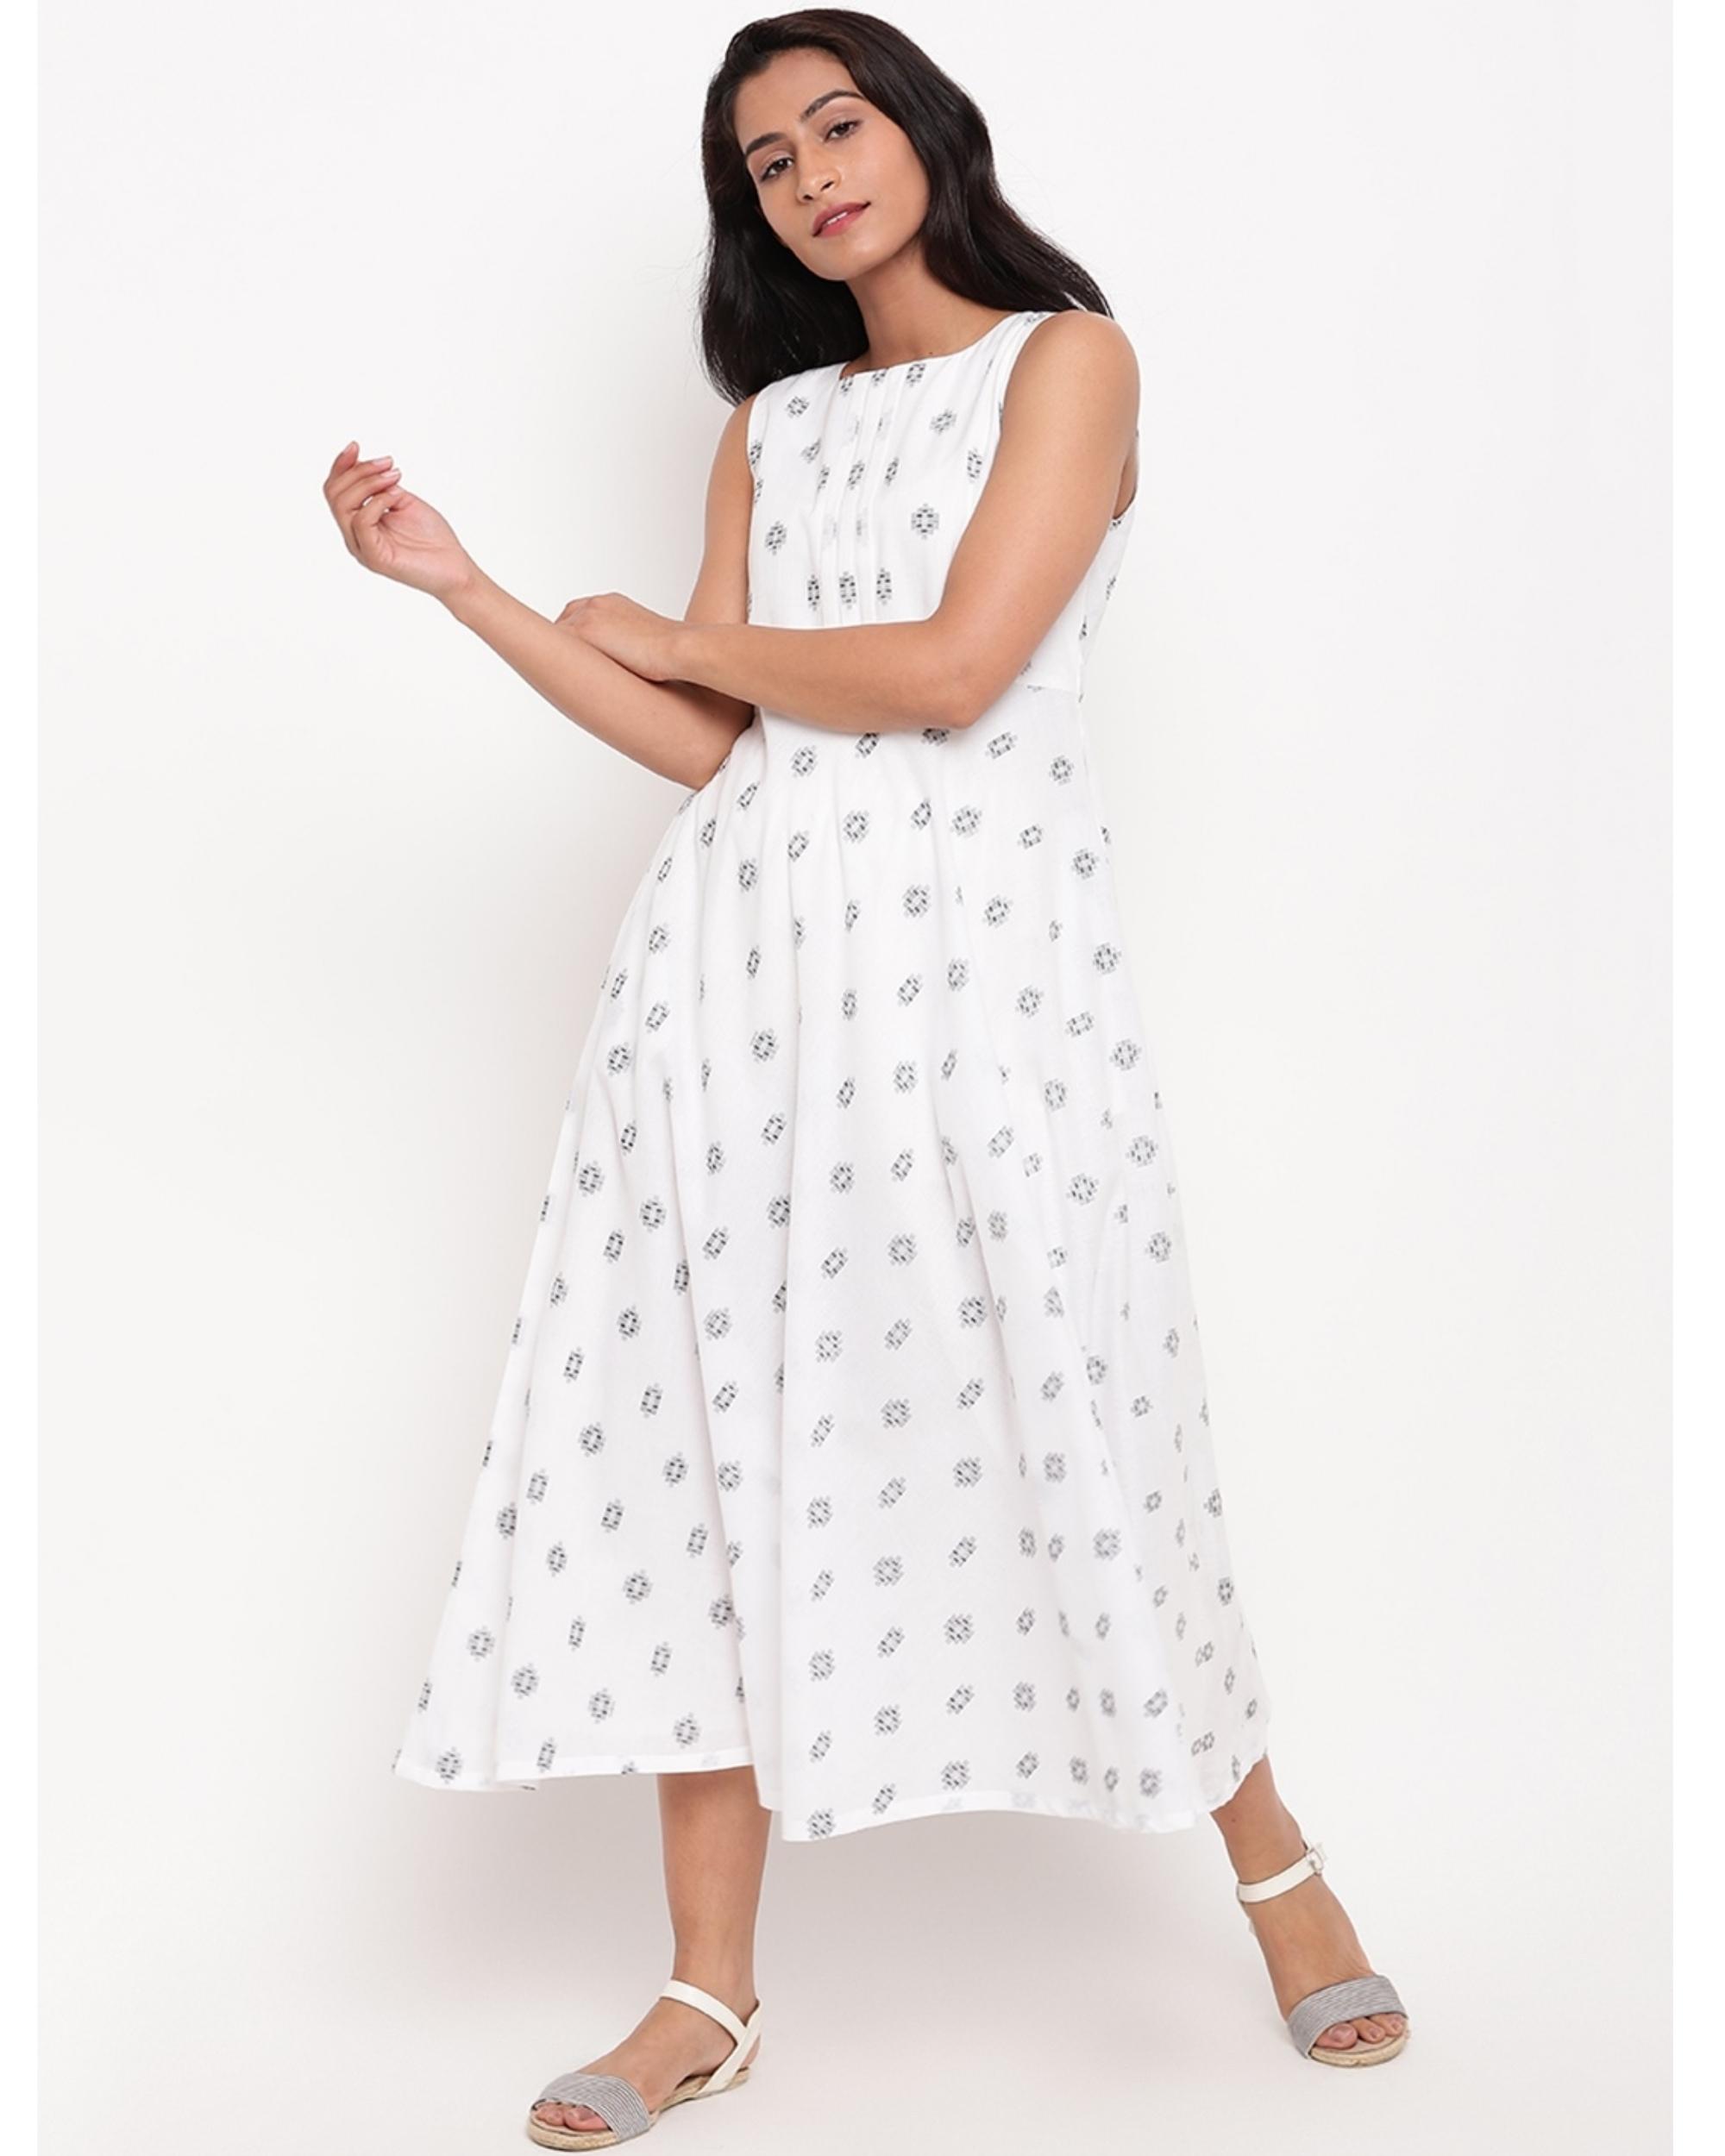 White and black printed dress